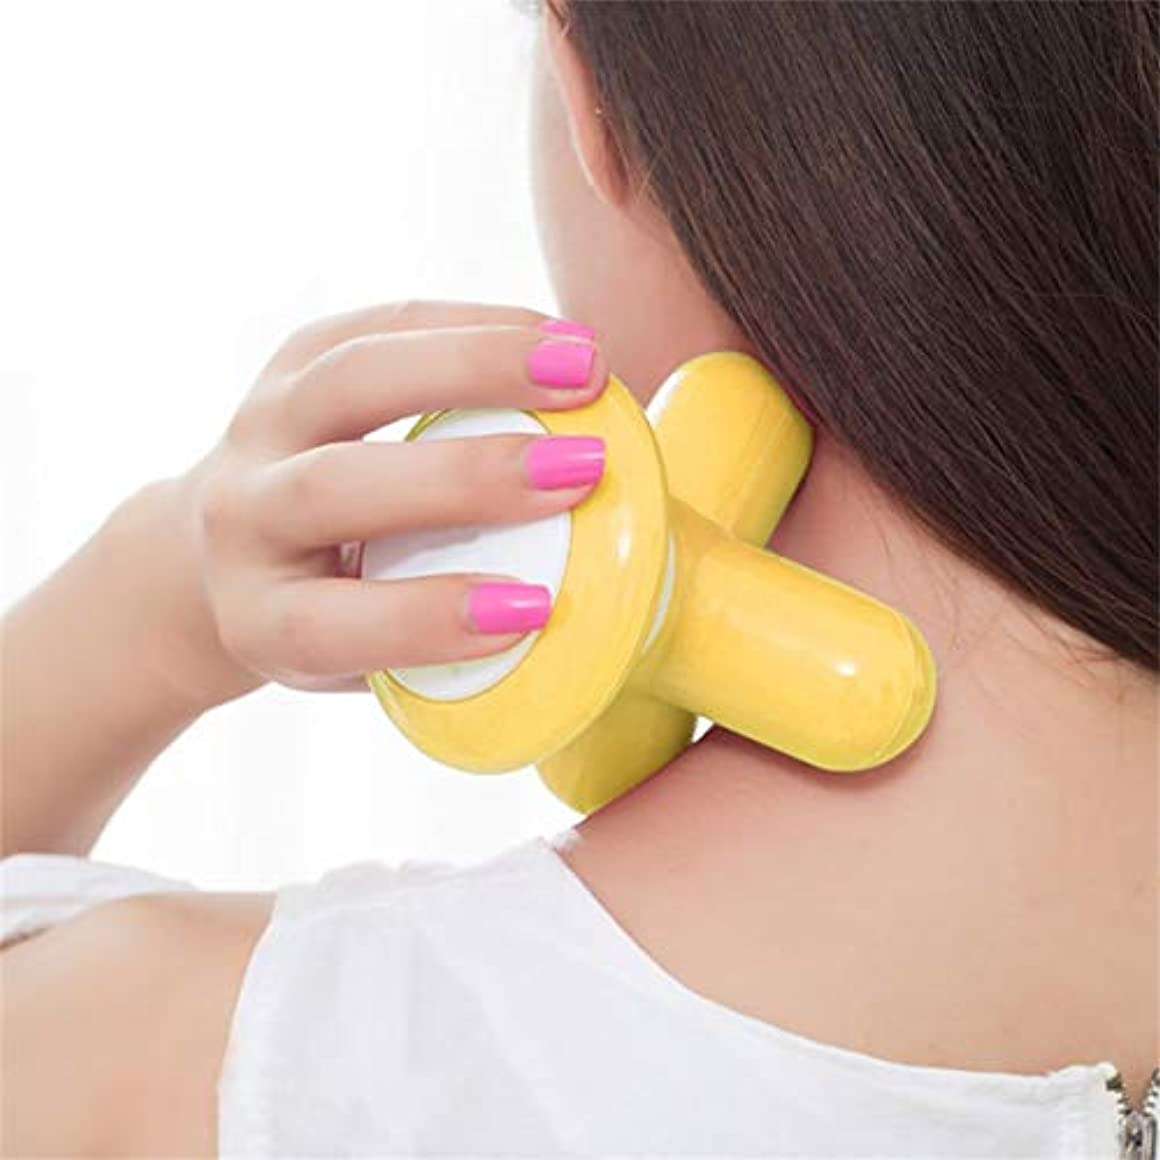 Mini Electric Handled Wave Vibrating Massager USB Battery Full Body Massage Ultra-compact Lightweight Convenient...